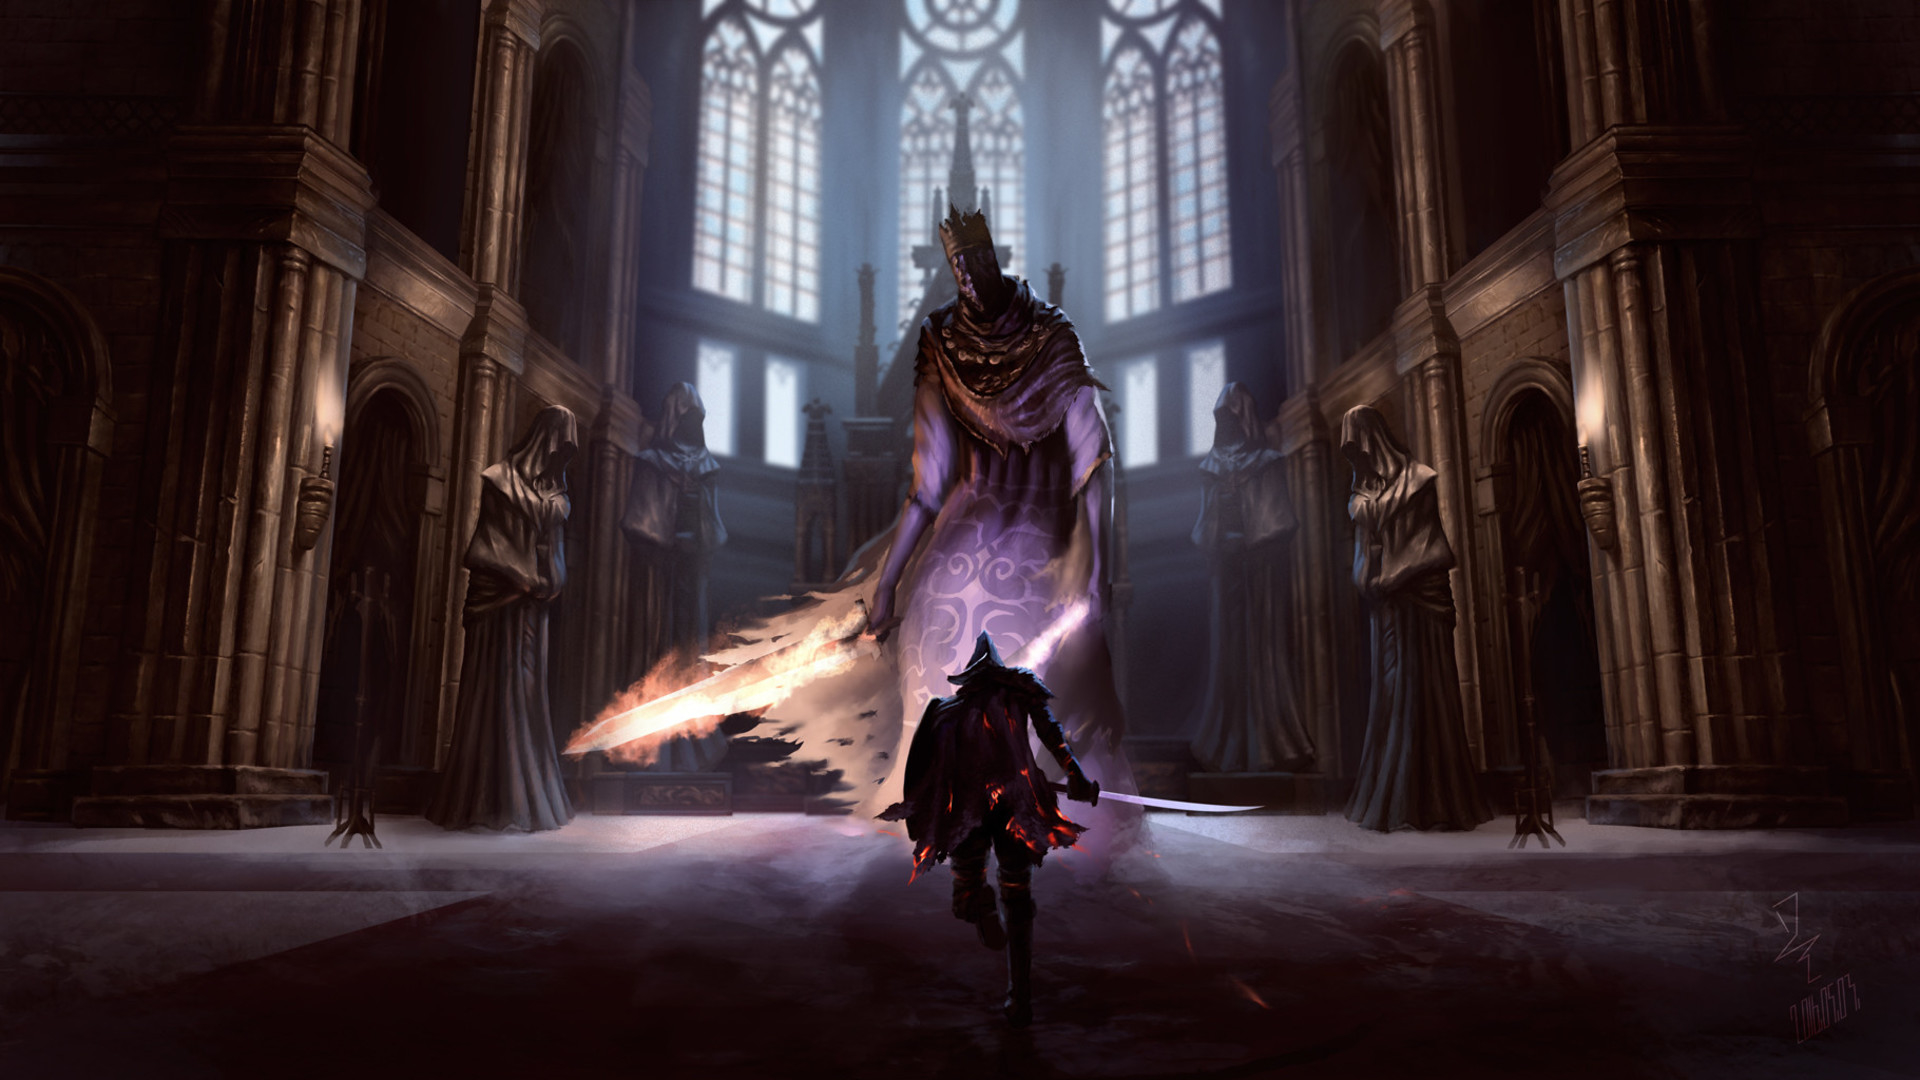 Pontiff Sulyvahn Dark Souls 3 Wallpaper, HD Games 4K ...